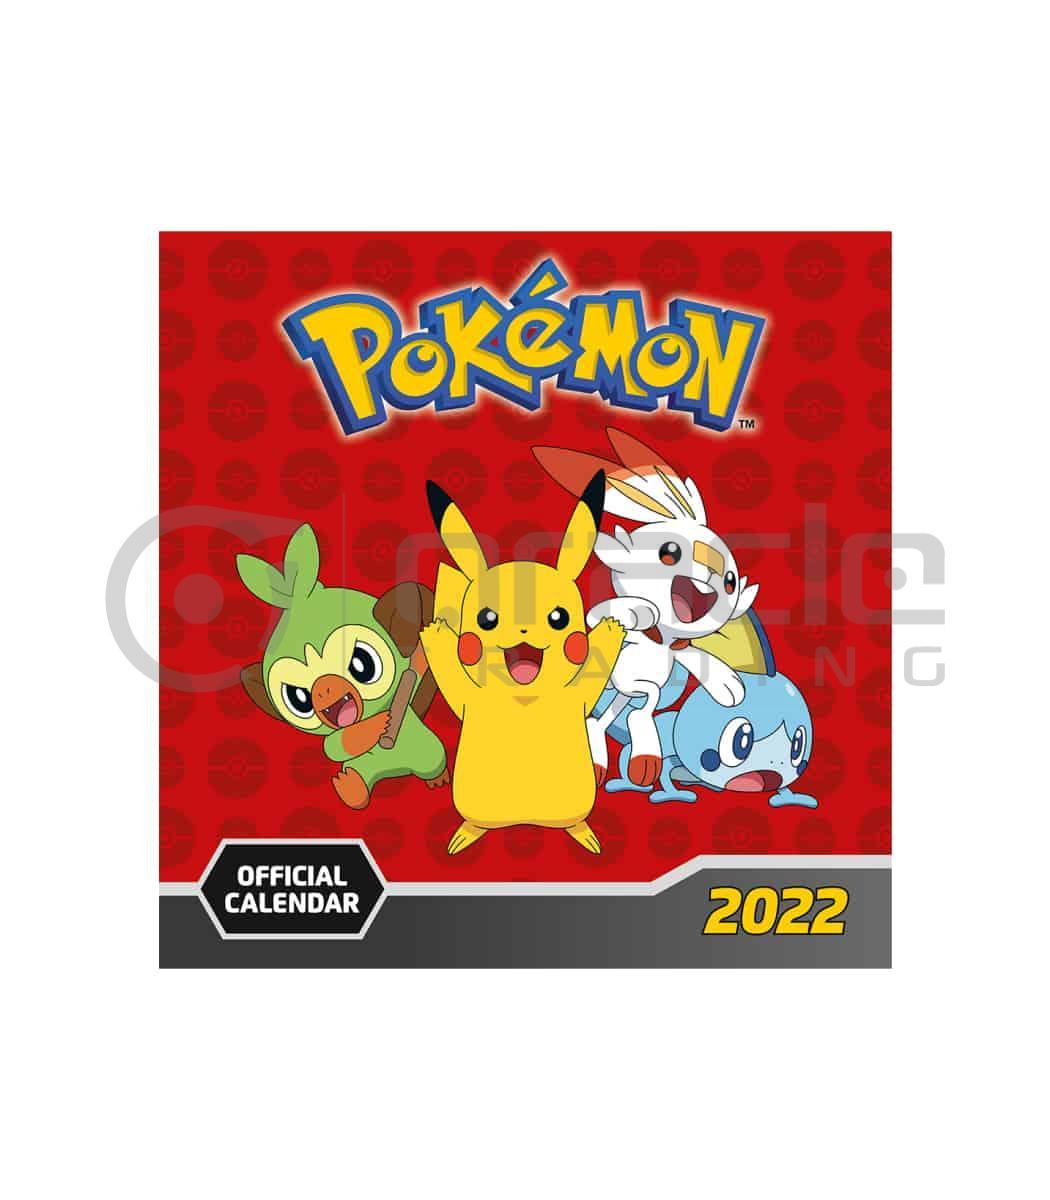 Pokémon 2022 Calendar (OCT Delivery)